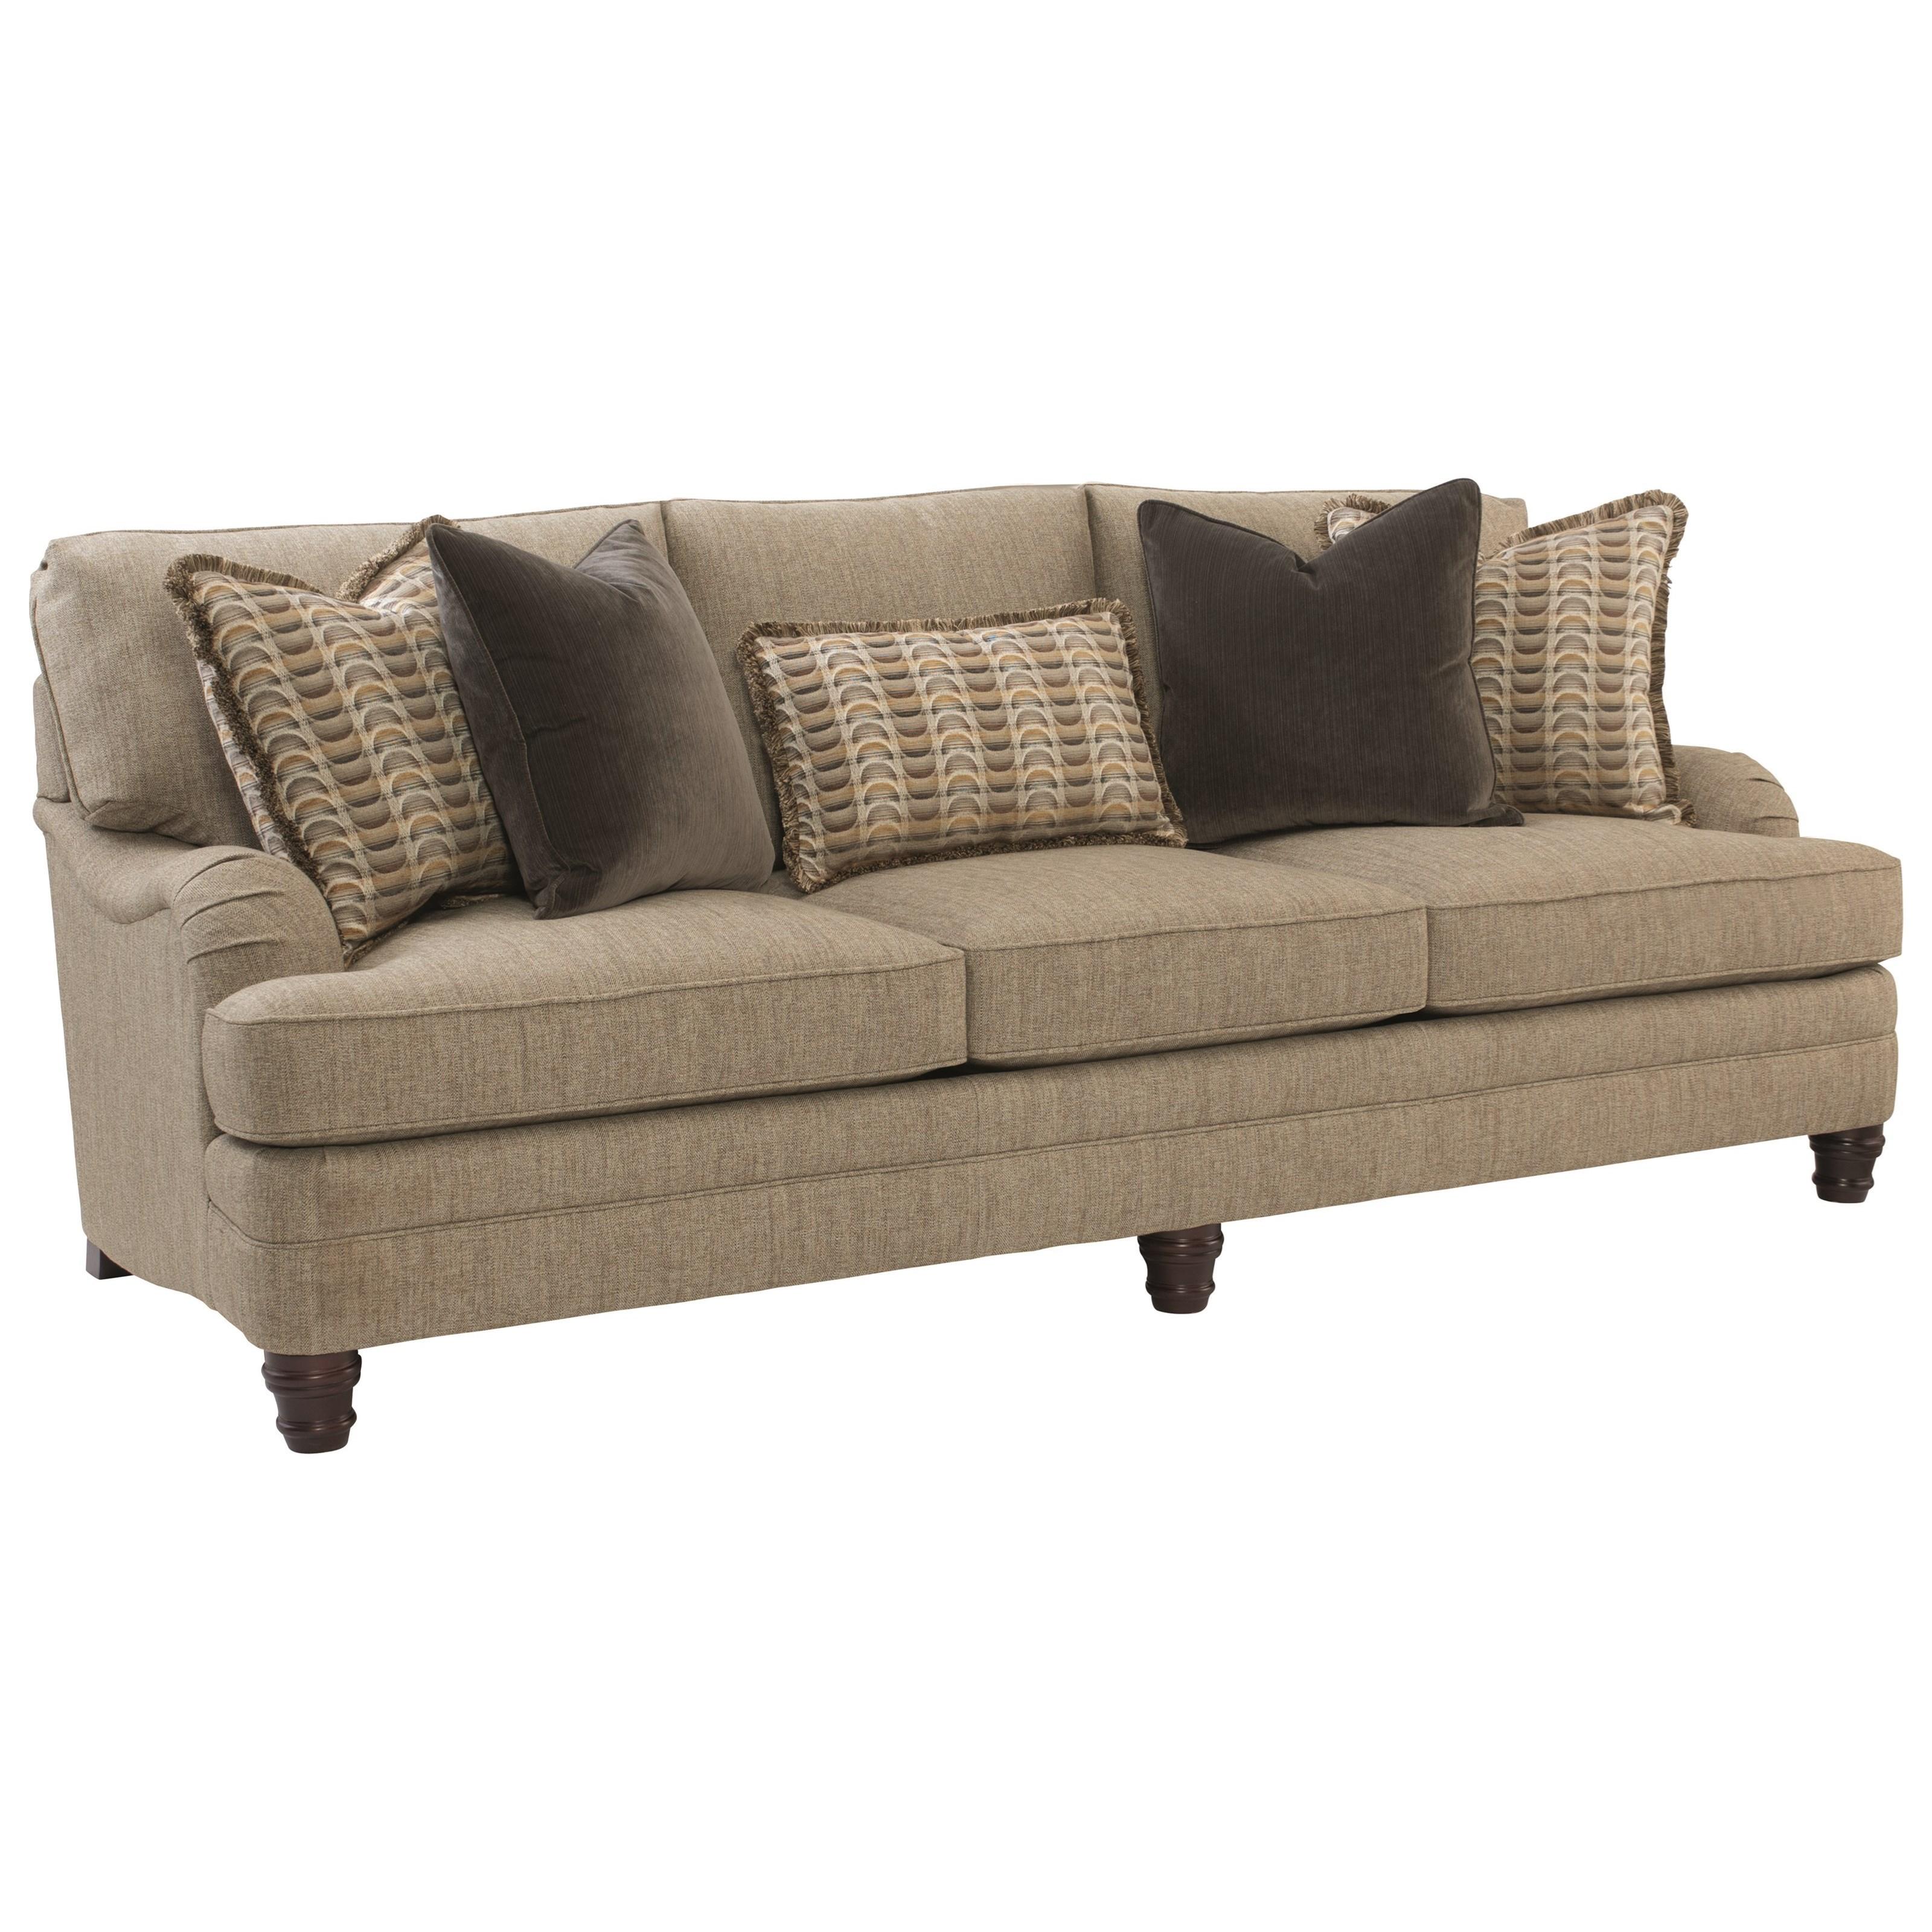 Bernhardt Tarleton Sofa - Item Number: B4267-2217-020